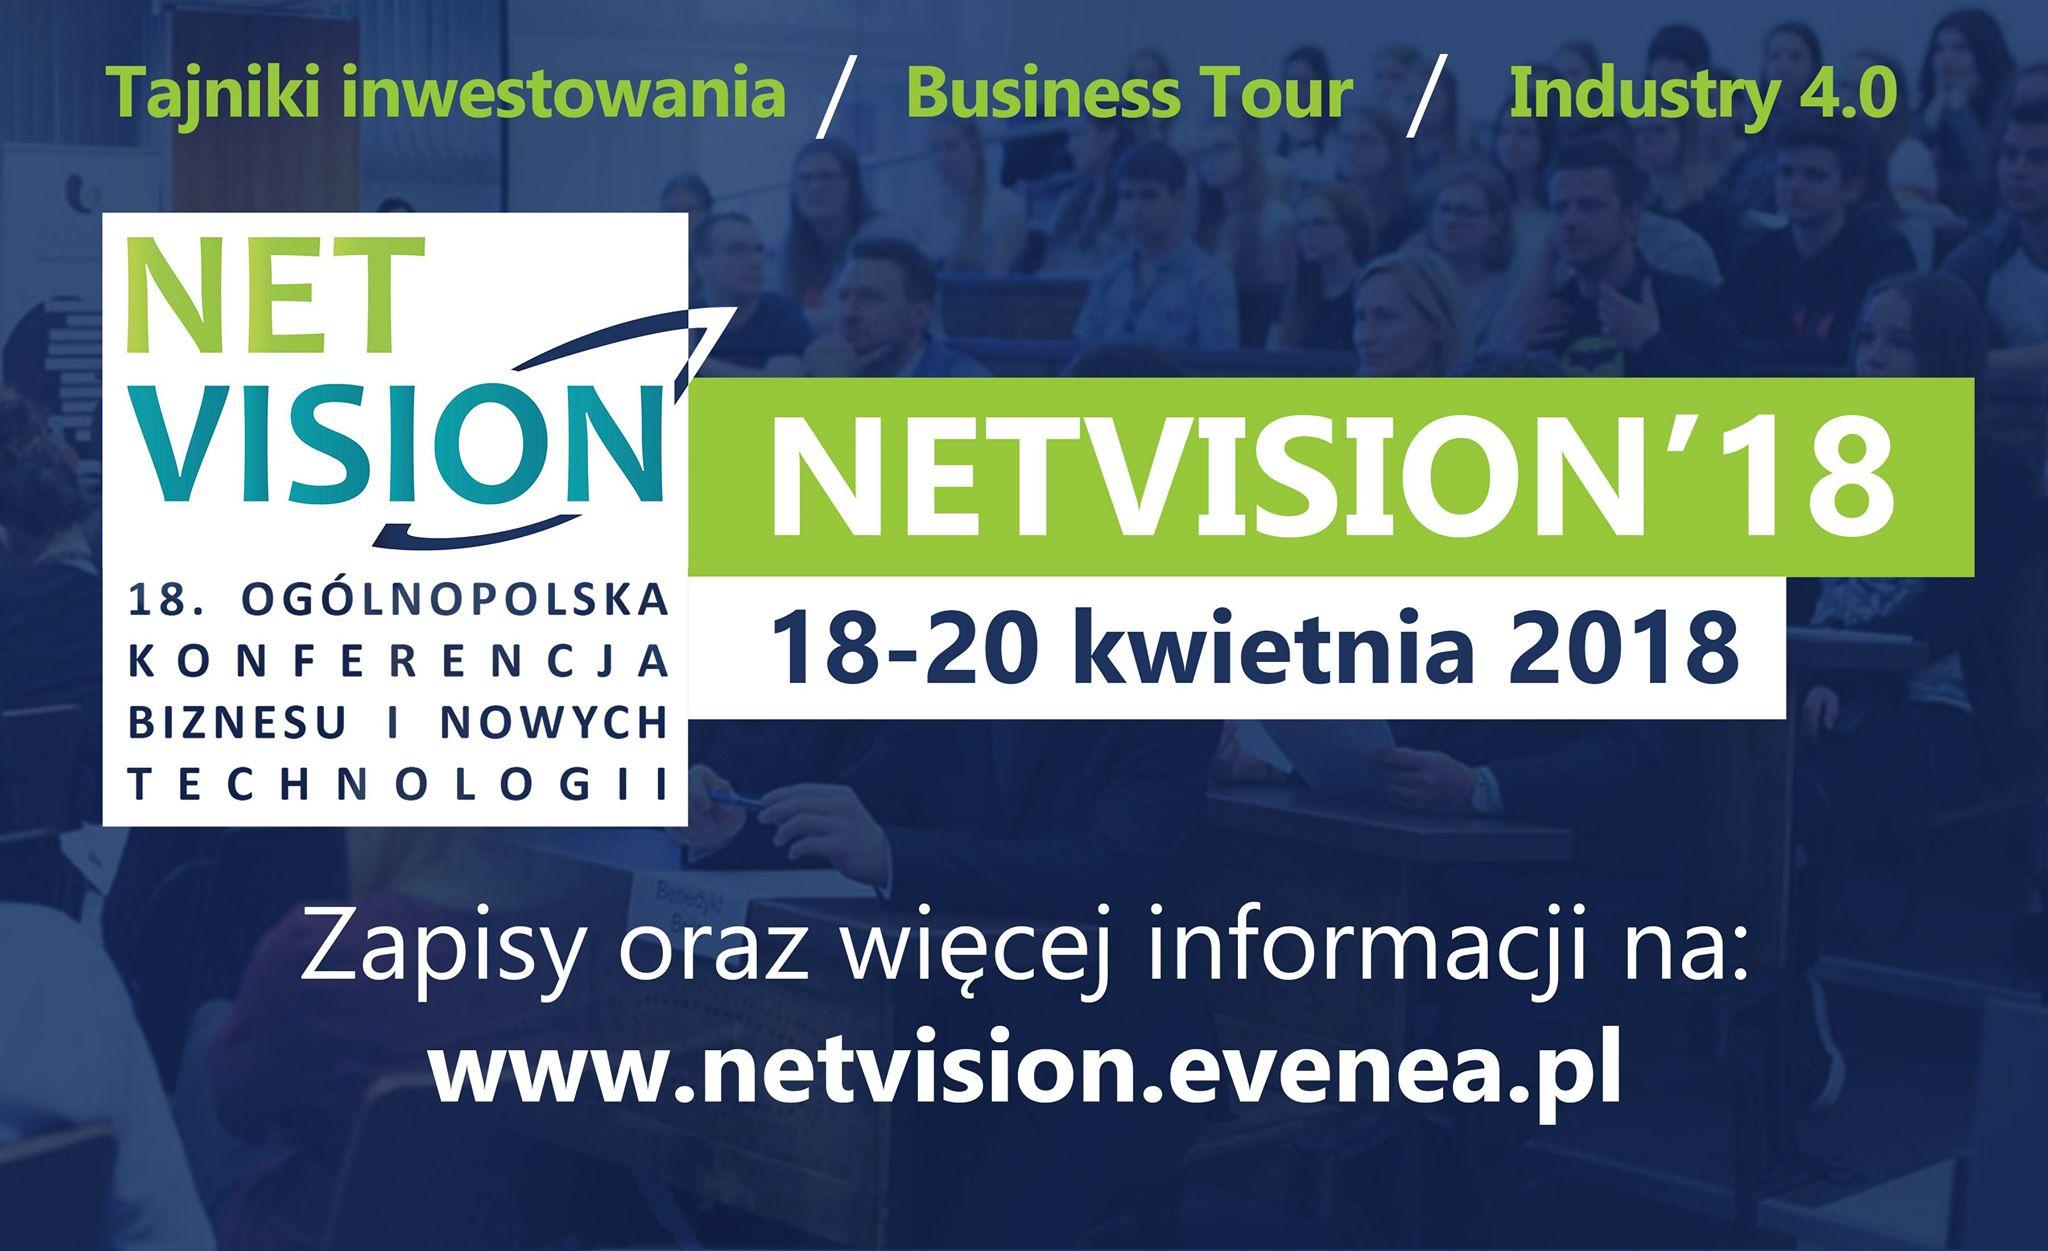 Konferencja Biznesu i Nowych Technologii NetVision'18